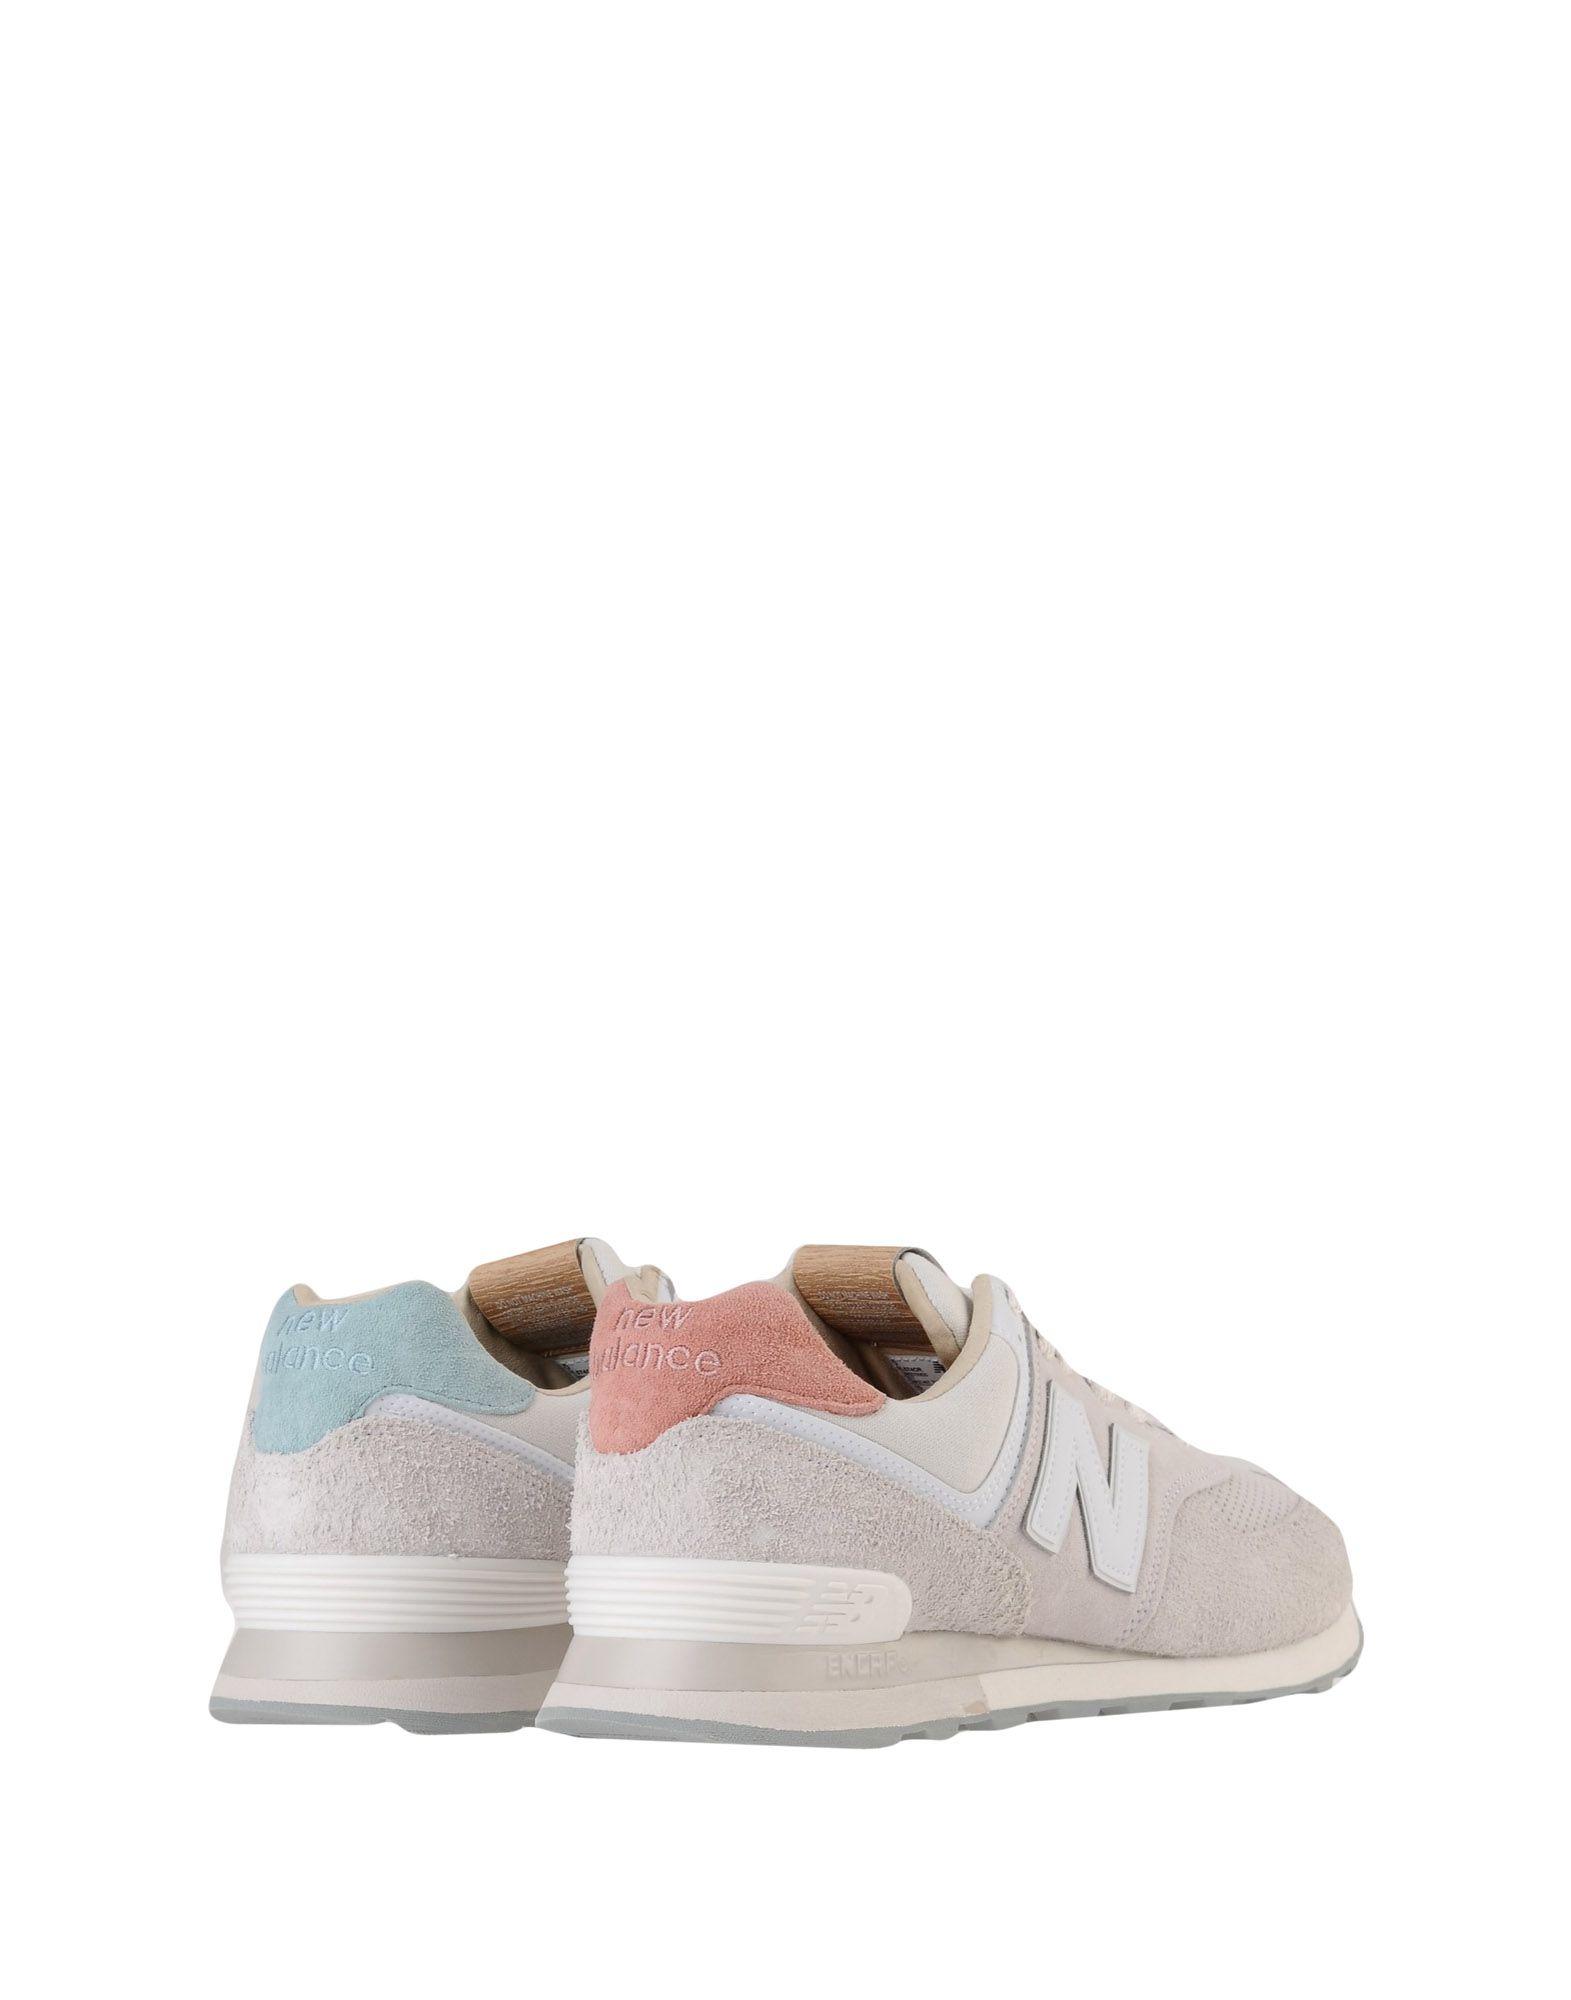 Rabatt echte Schuhe New Balance 574 Peaks To Streets Pack  11467192TO